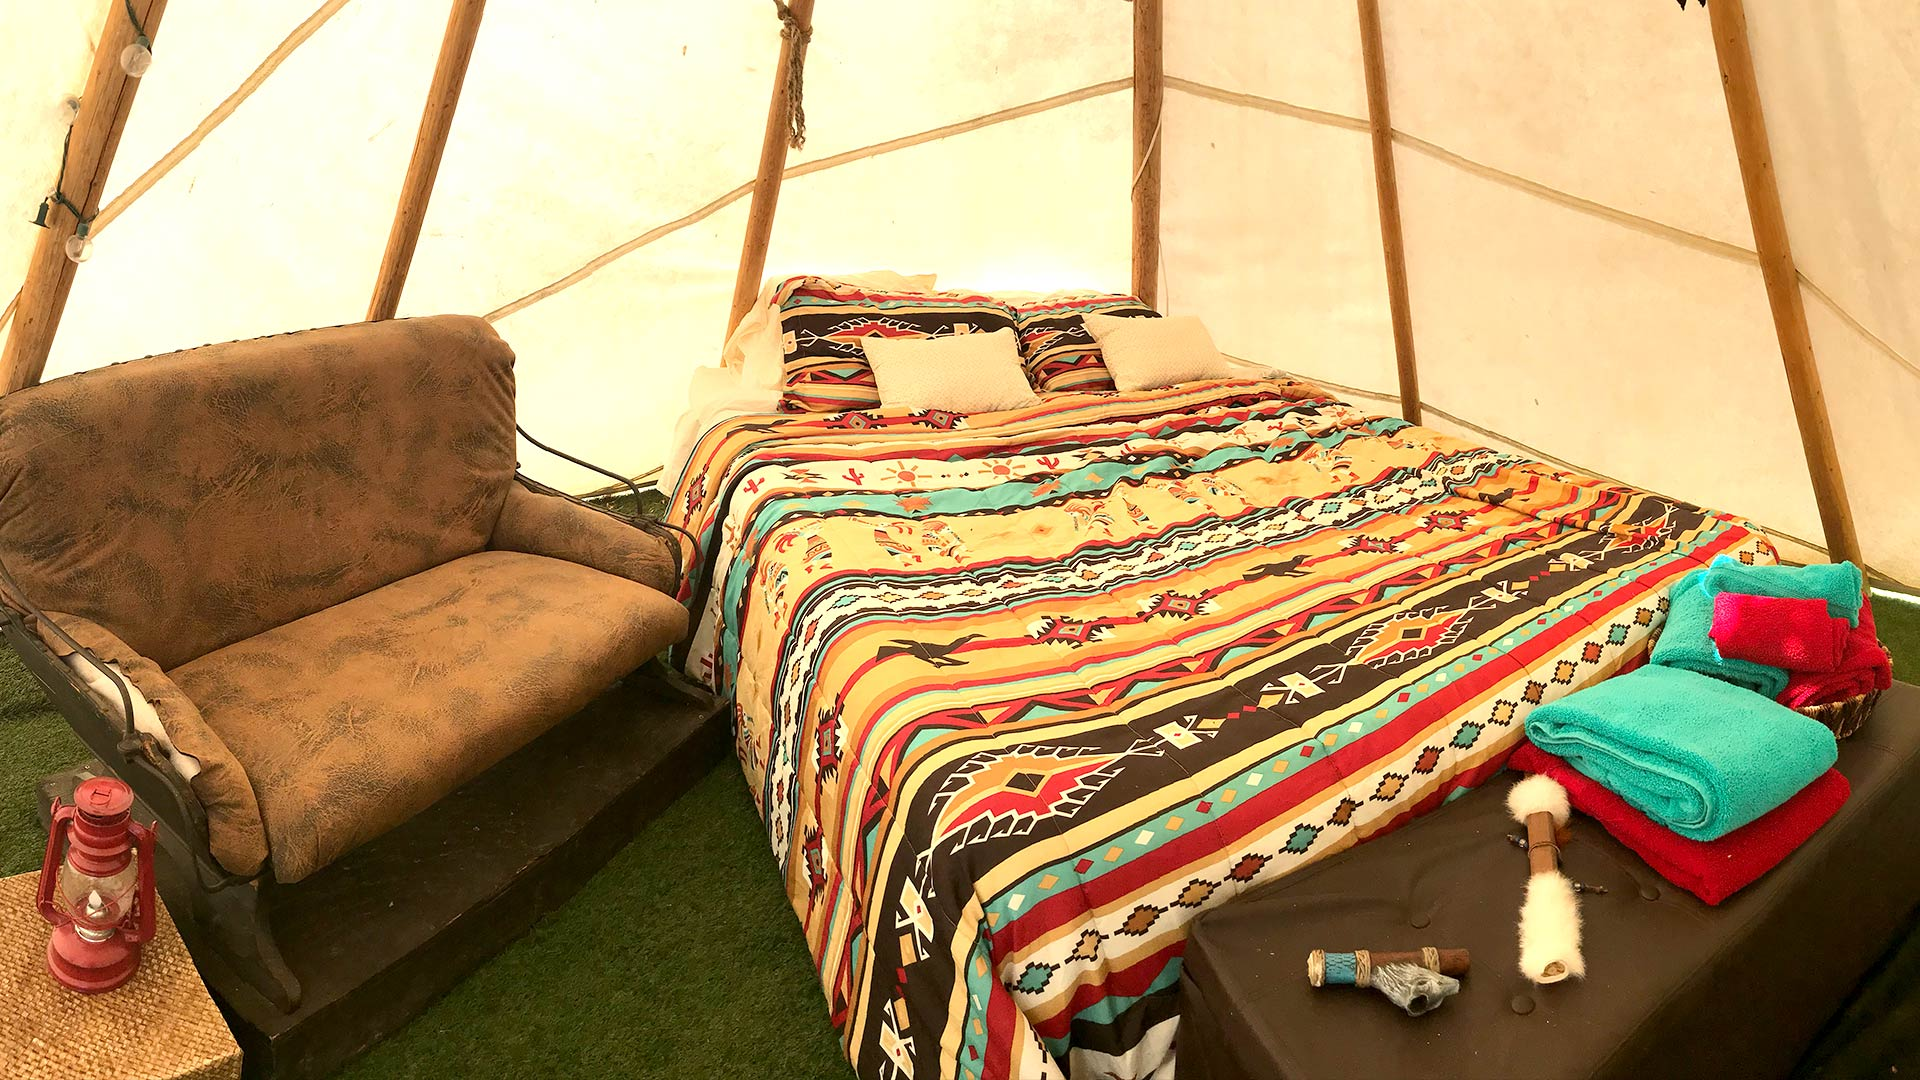 inside the tee pee tent